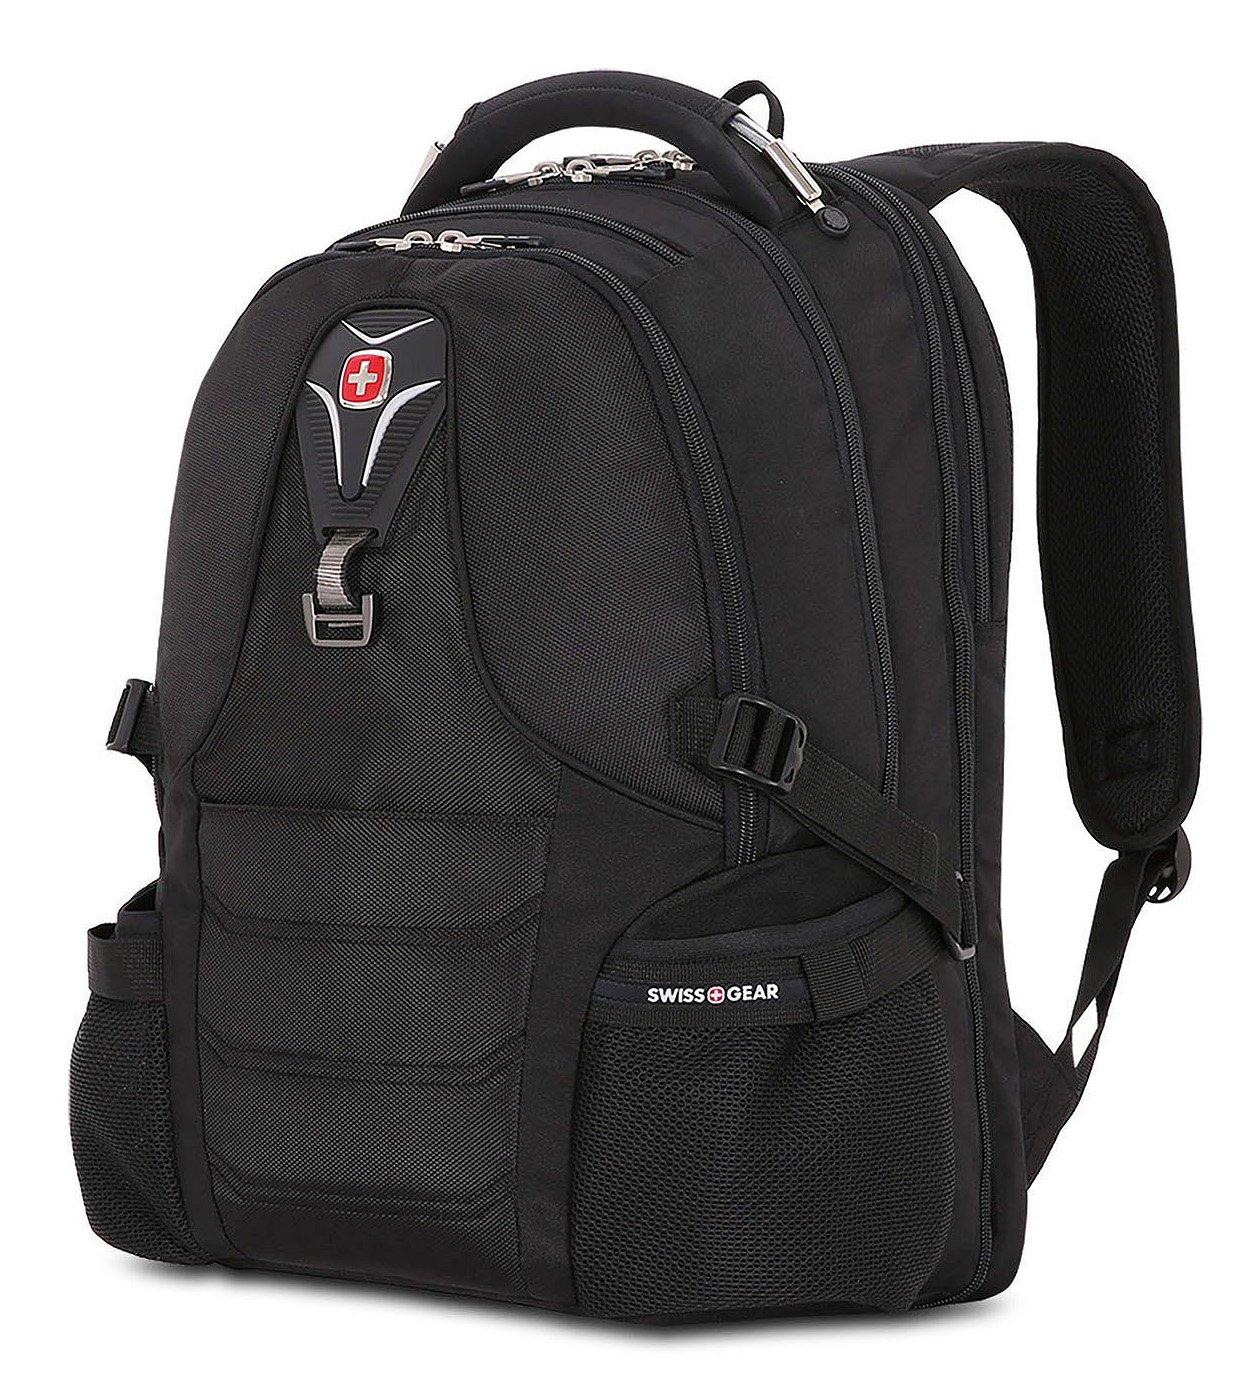 SwissGear Backpack Bookbag ScanSmart Laptop Notebook Backpack, Fits Most 17 Laptop Computers